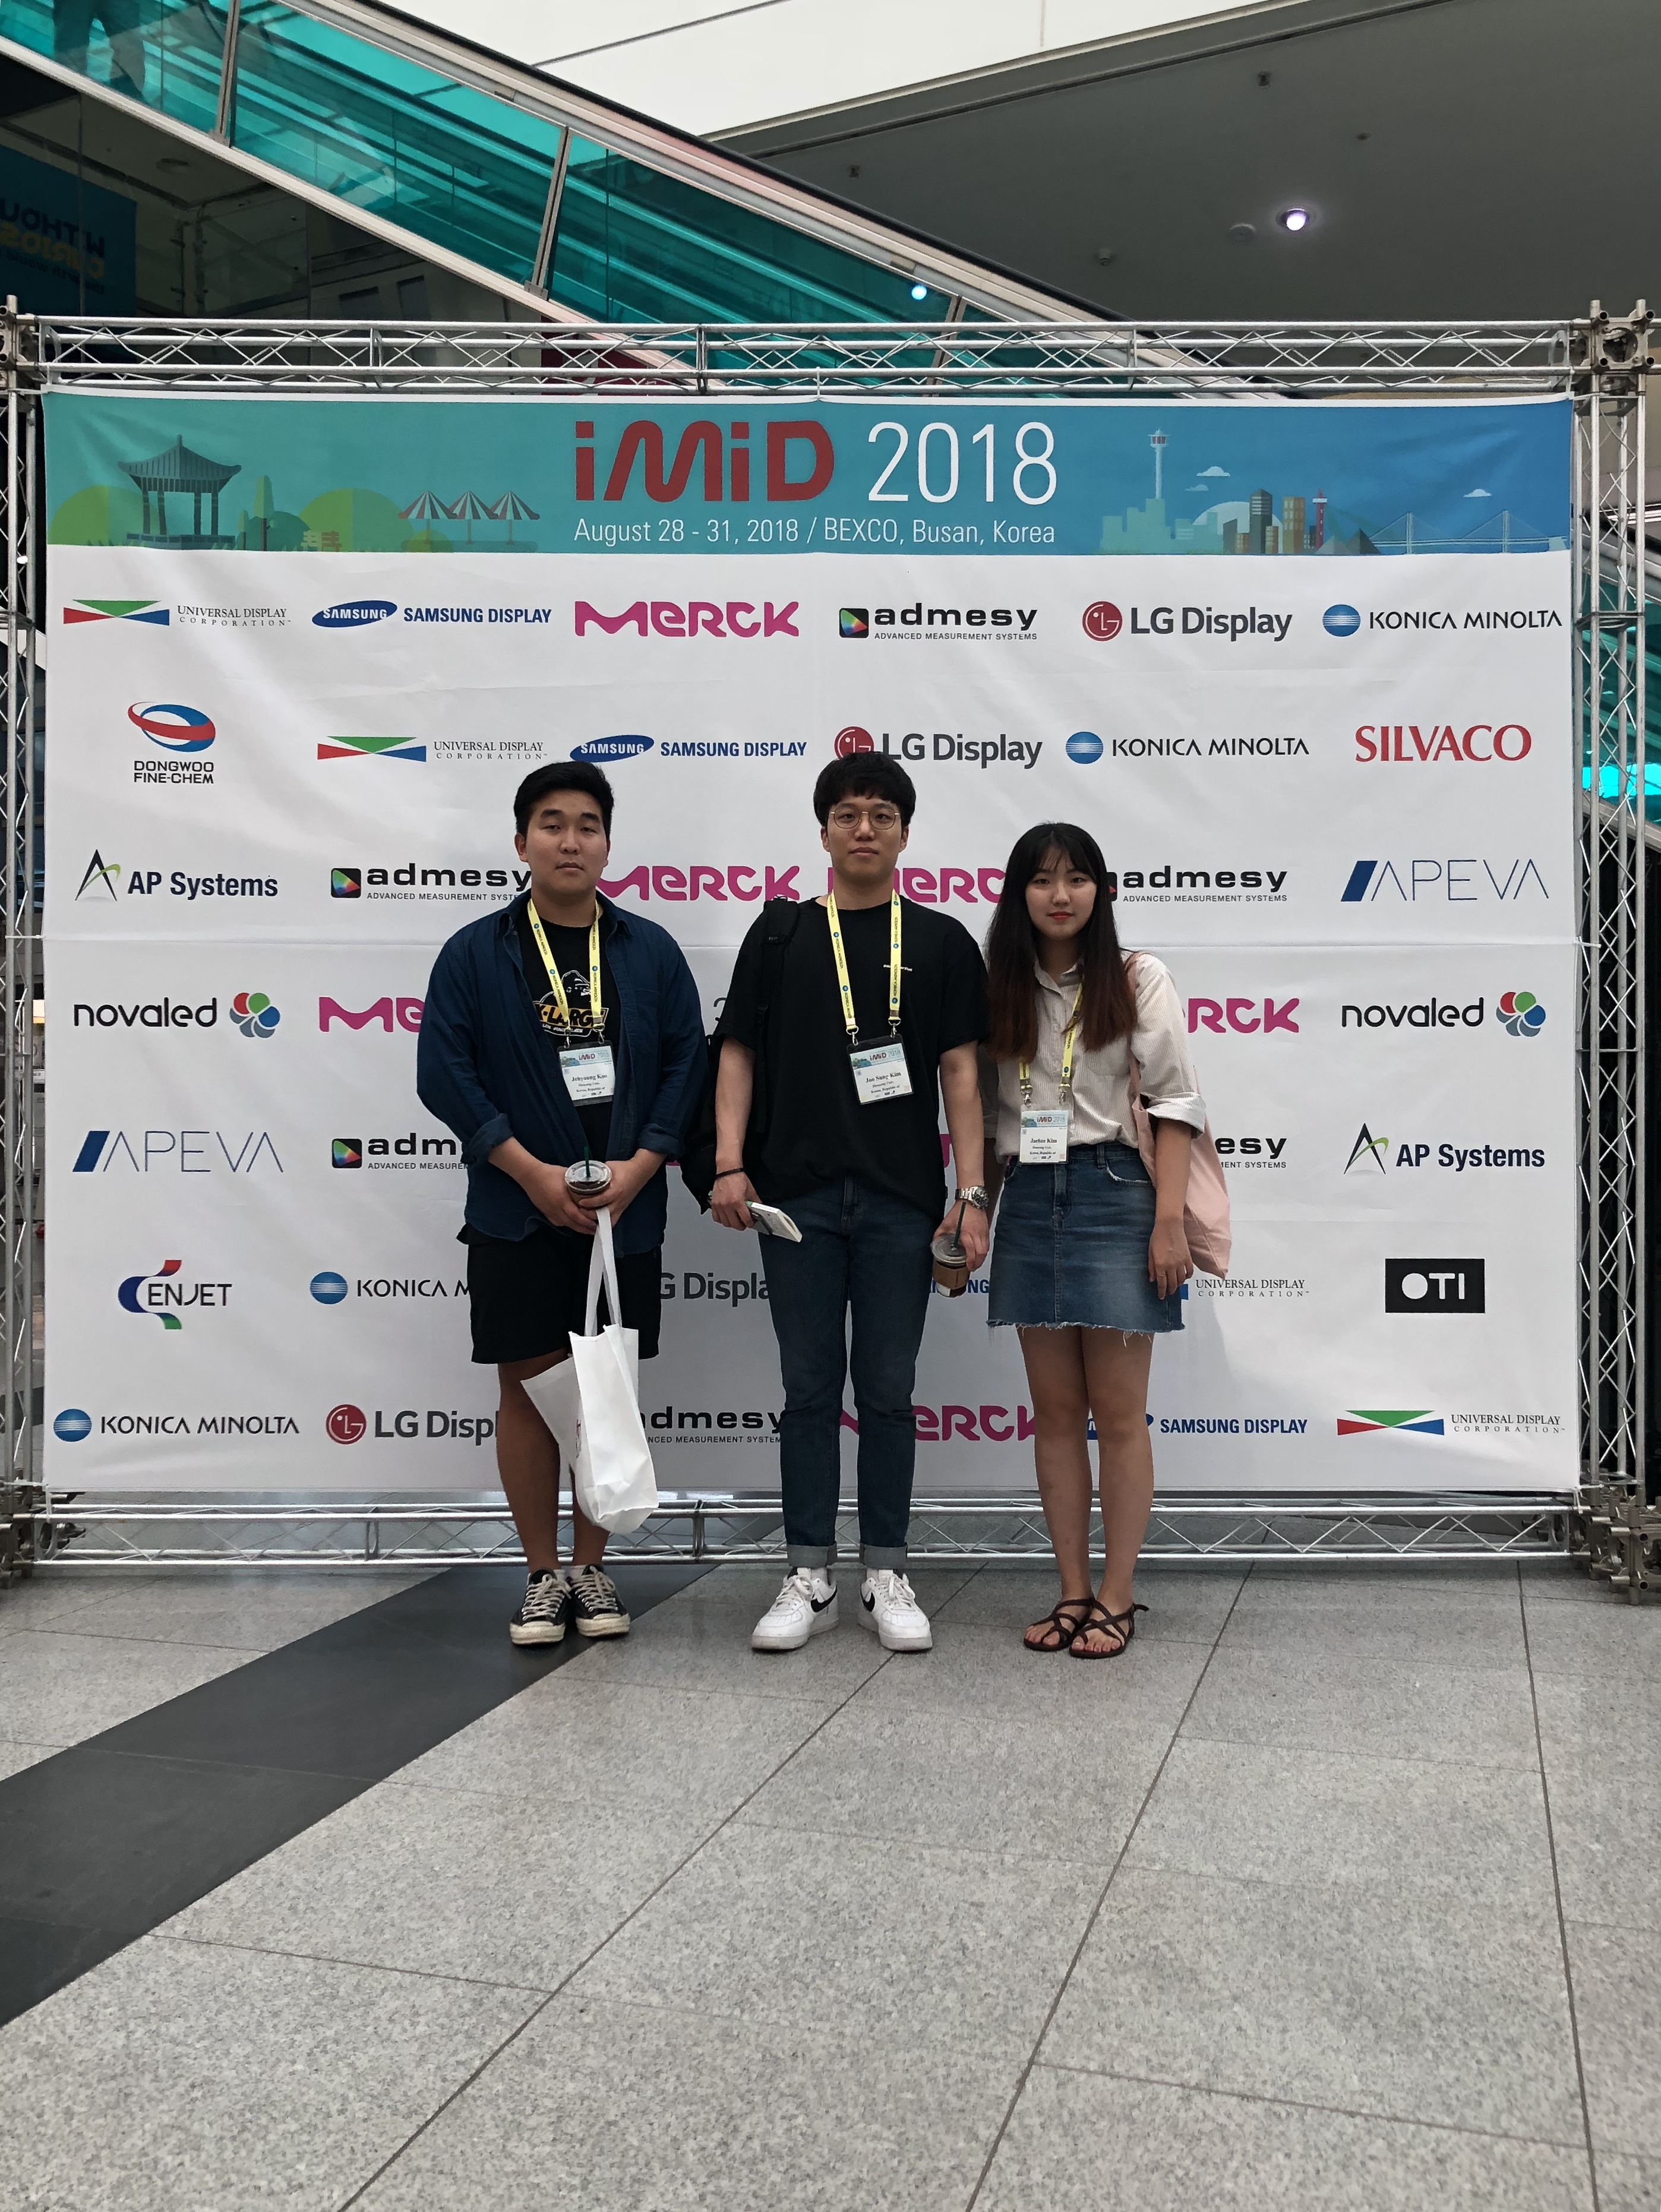 2018 IMID 8월